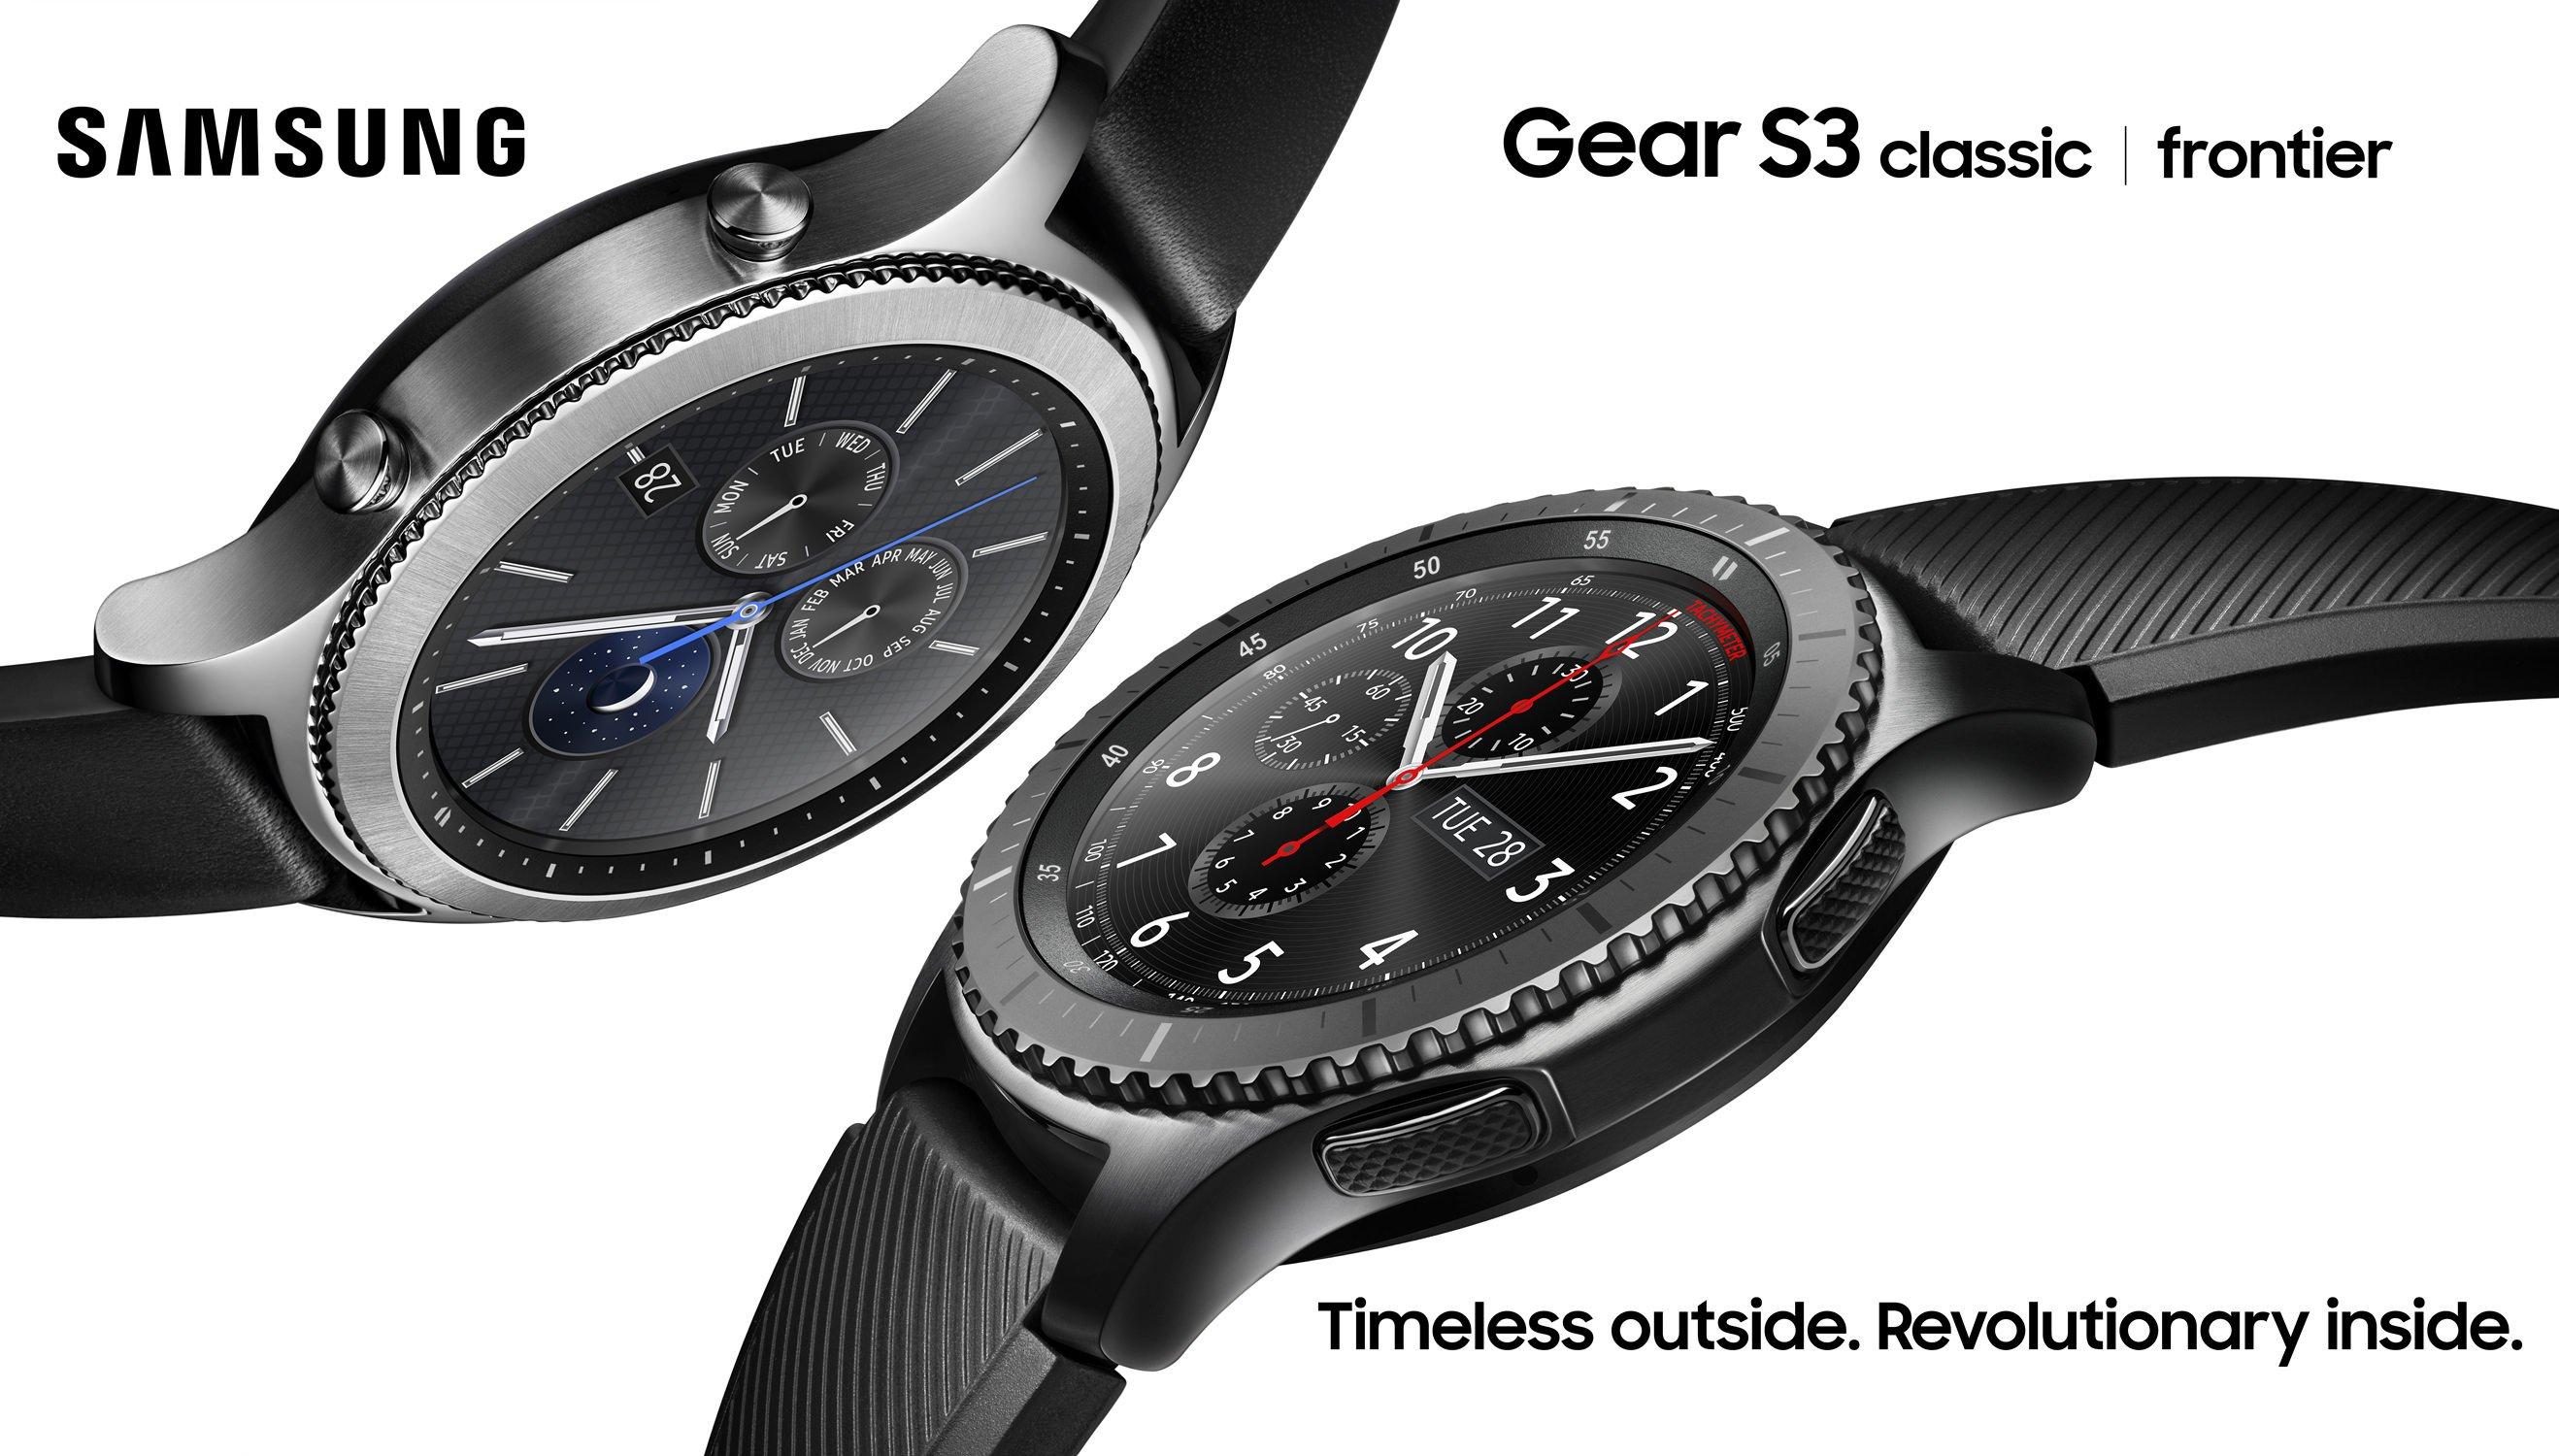 Samsung'un Yeni Akıllı Saati Gear S3